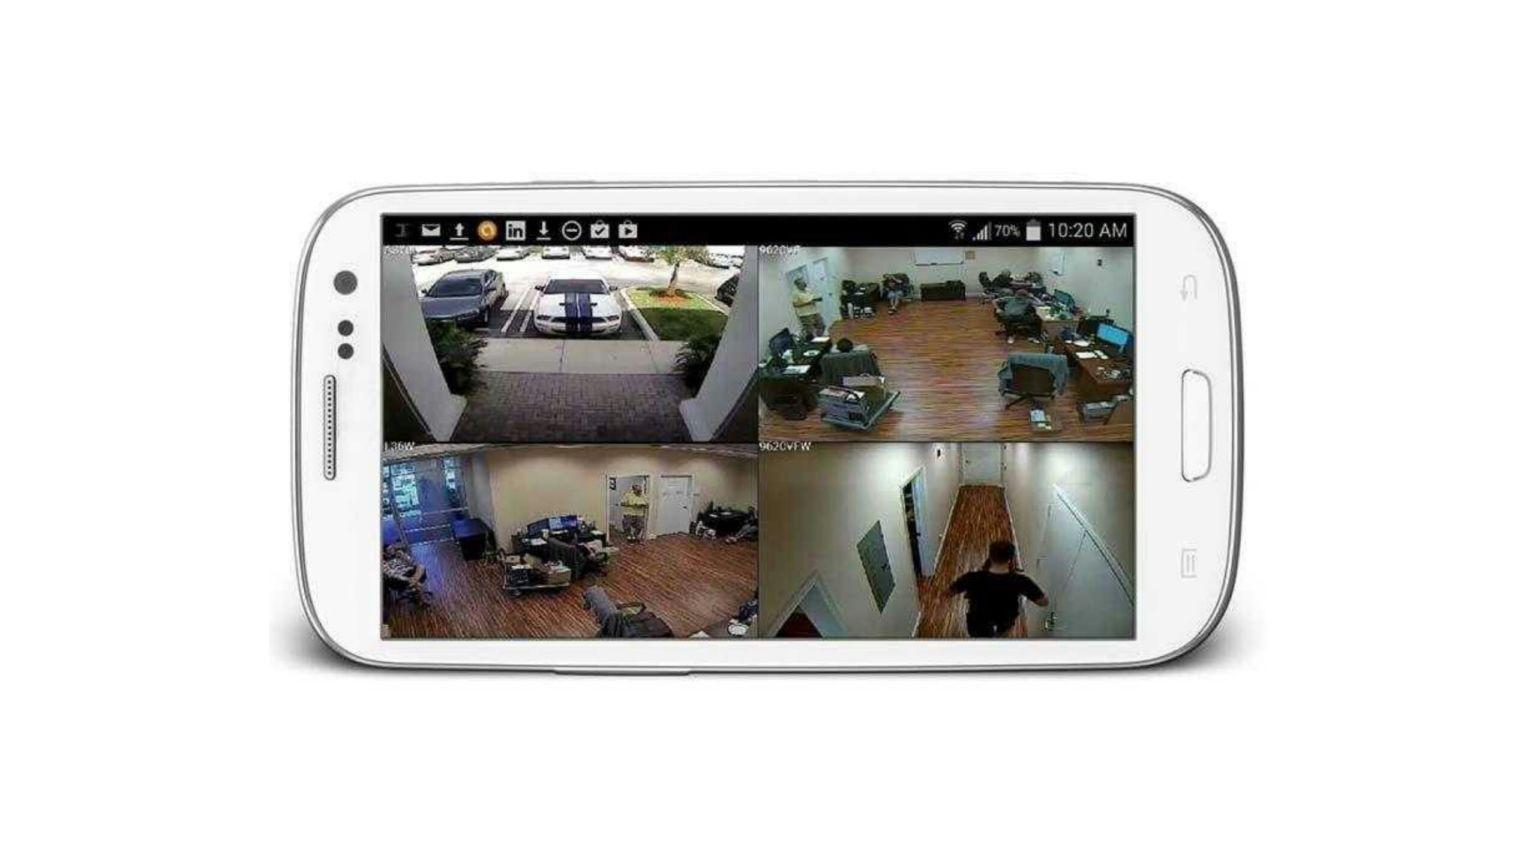 Mobile কে  CCTv cemera হিসেবে Use করুন তাউ internet ছাড়া – একদম ফ্রিতে (Use Hotspot) + HD screenShot